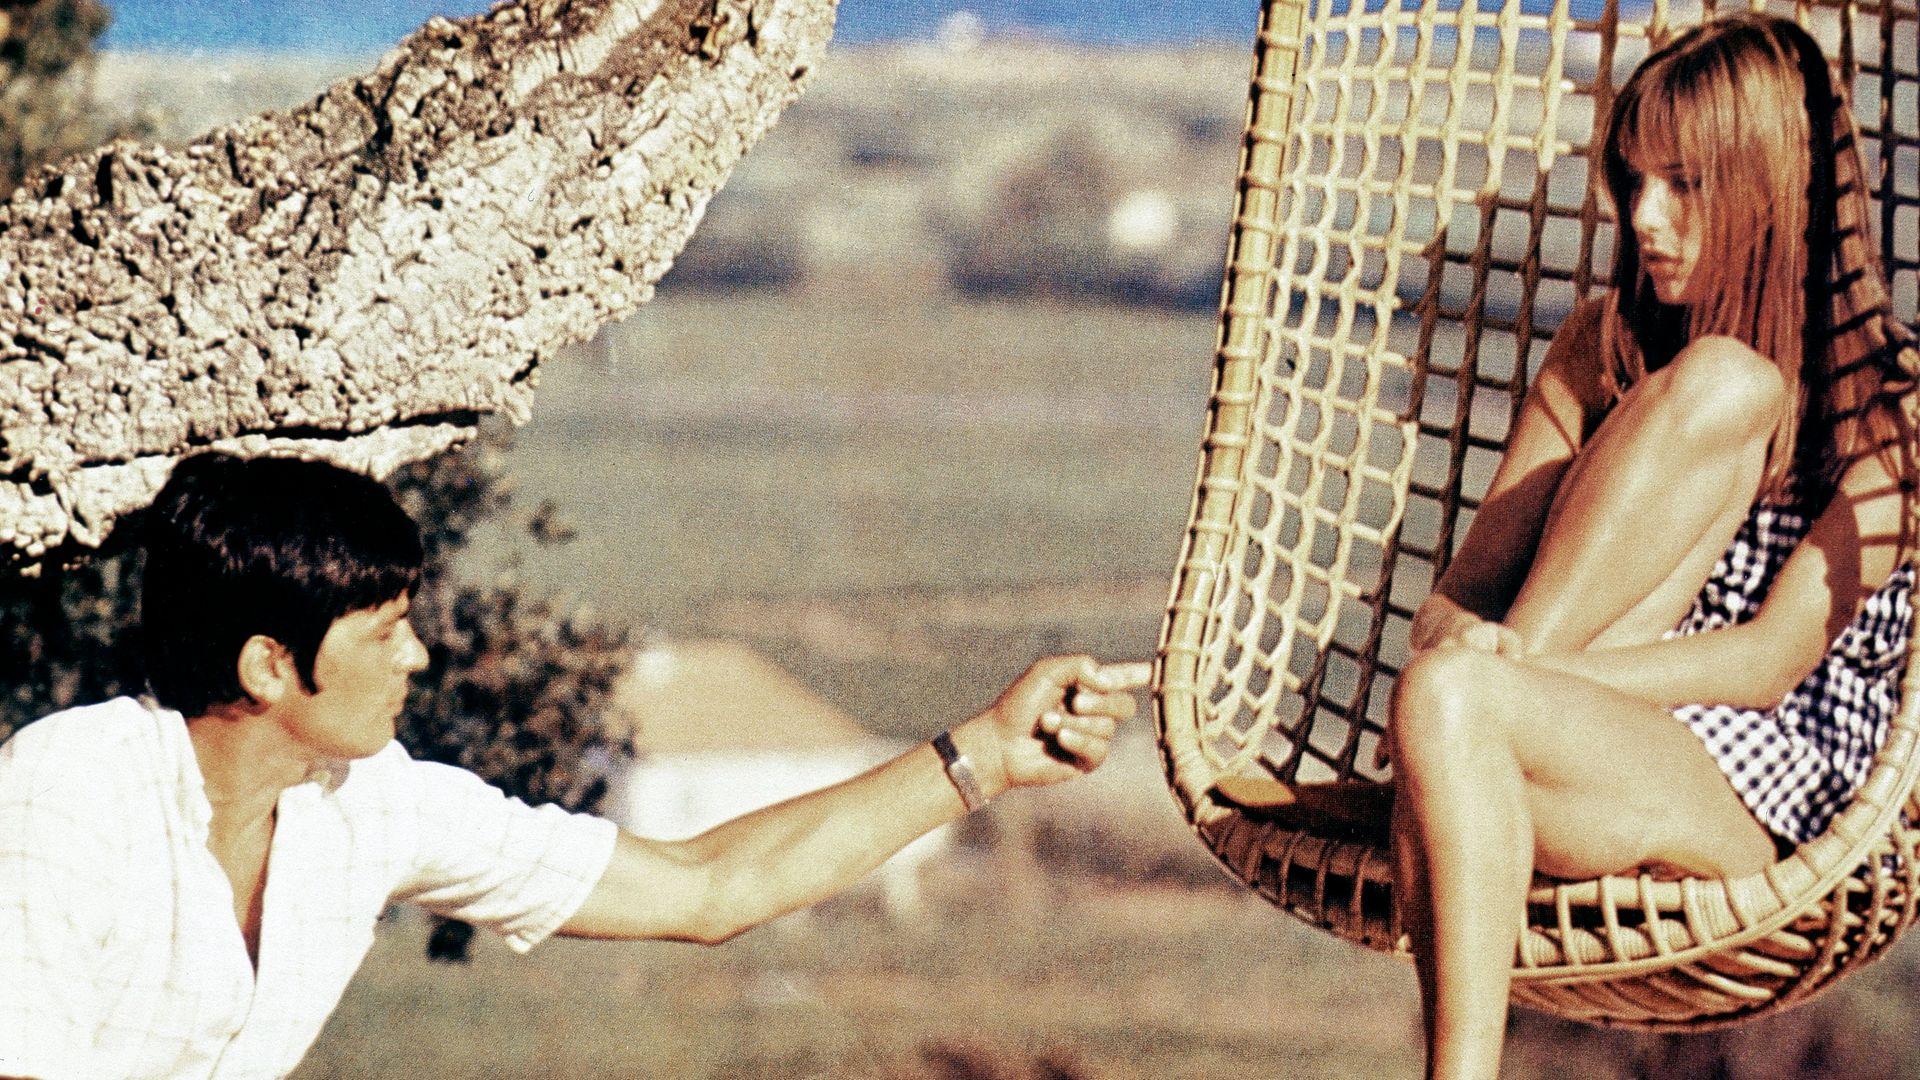 Alain Delon and Jane Birkin on the set of La Piscine (1969) - Credit: FilmPublicityArchive/United Arch